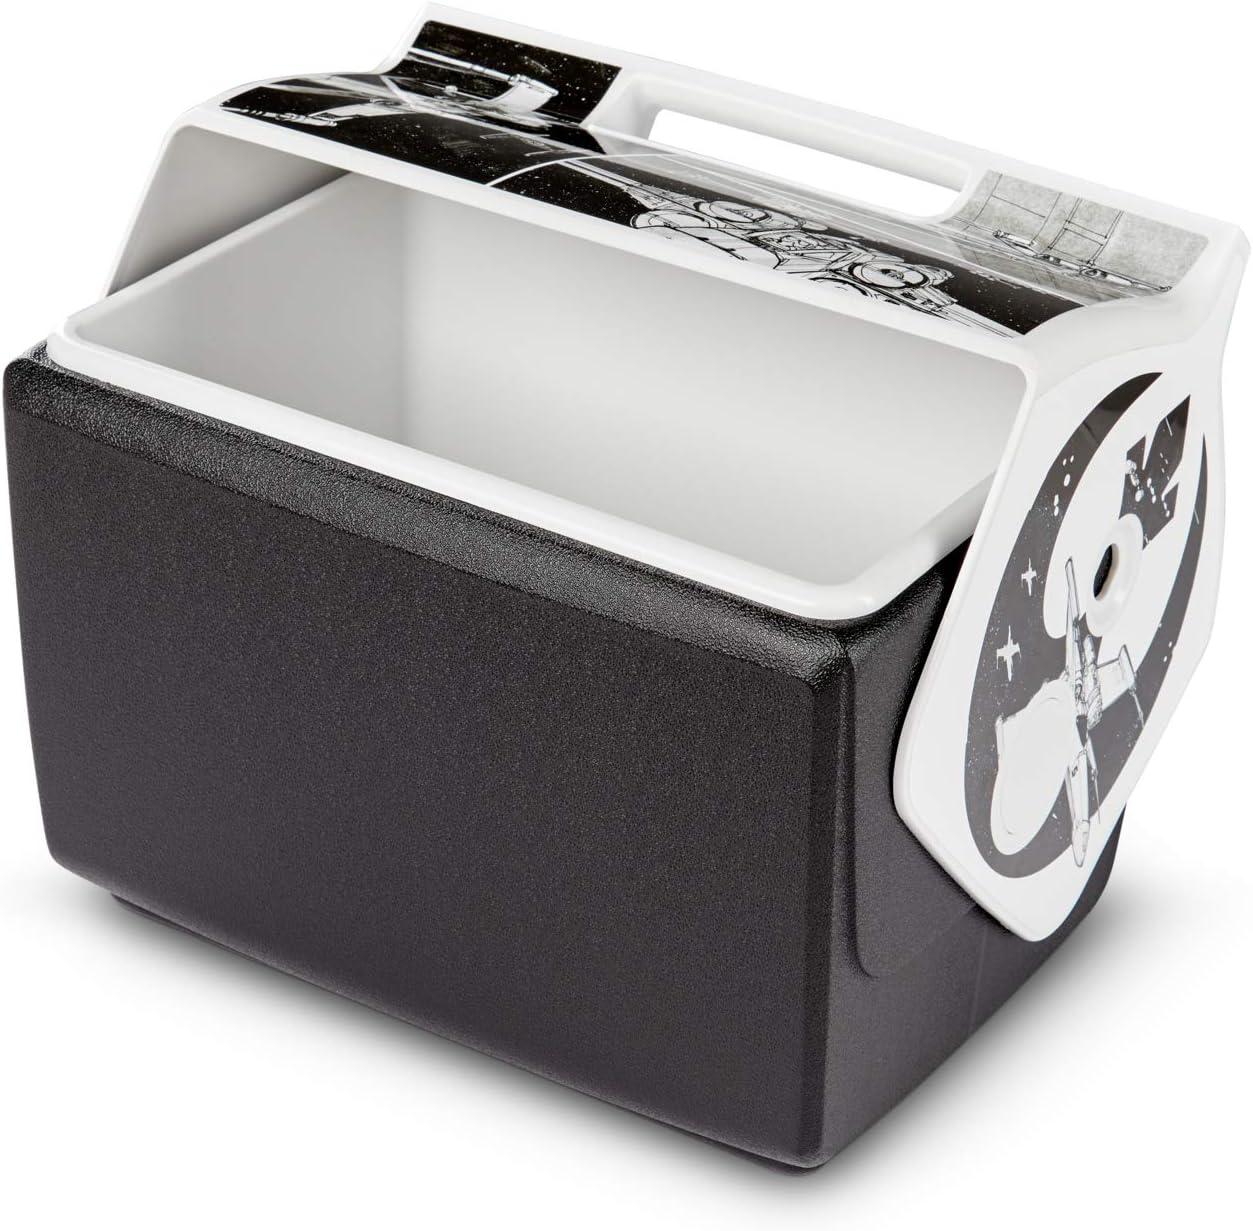 Igloo Playmate Cooler